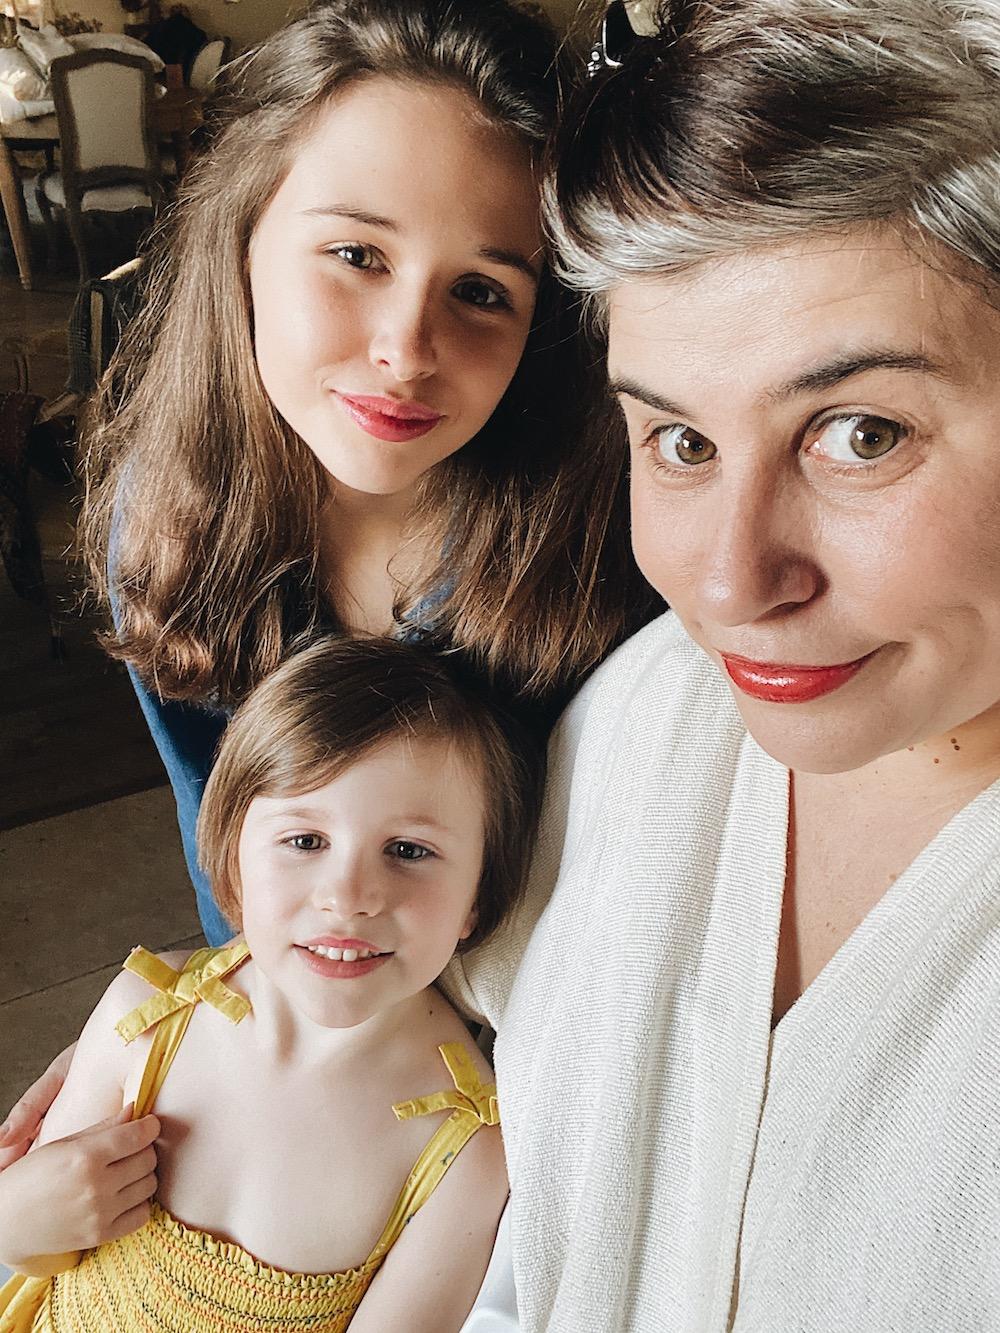 ete-des-meres-2020-famille-maman-blogzine-famille-sundaygrenadine.jpg